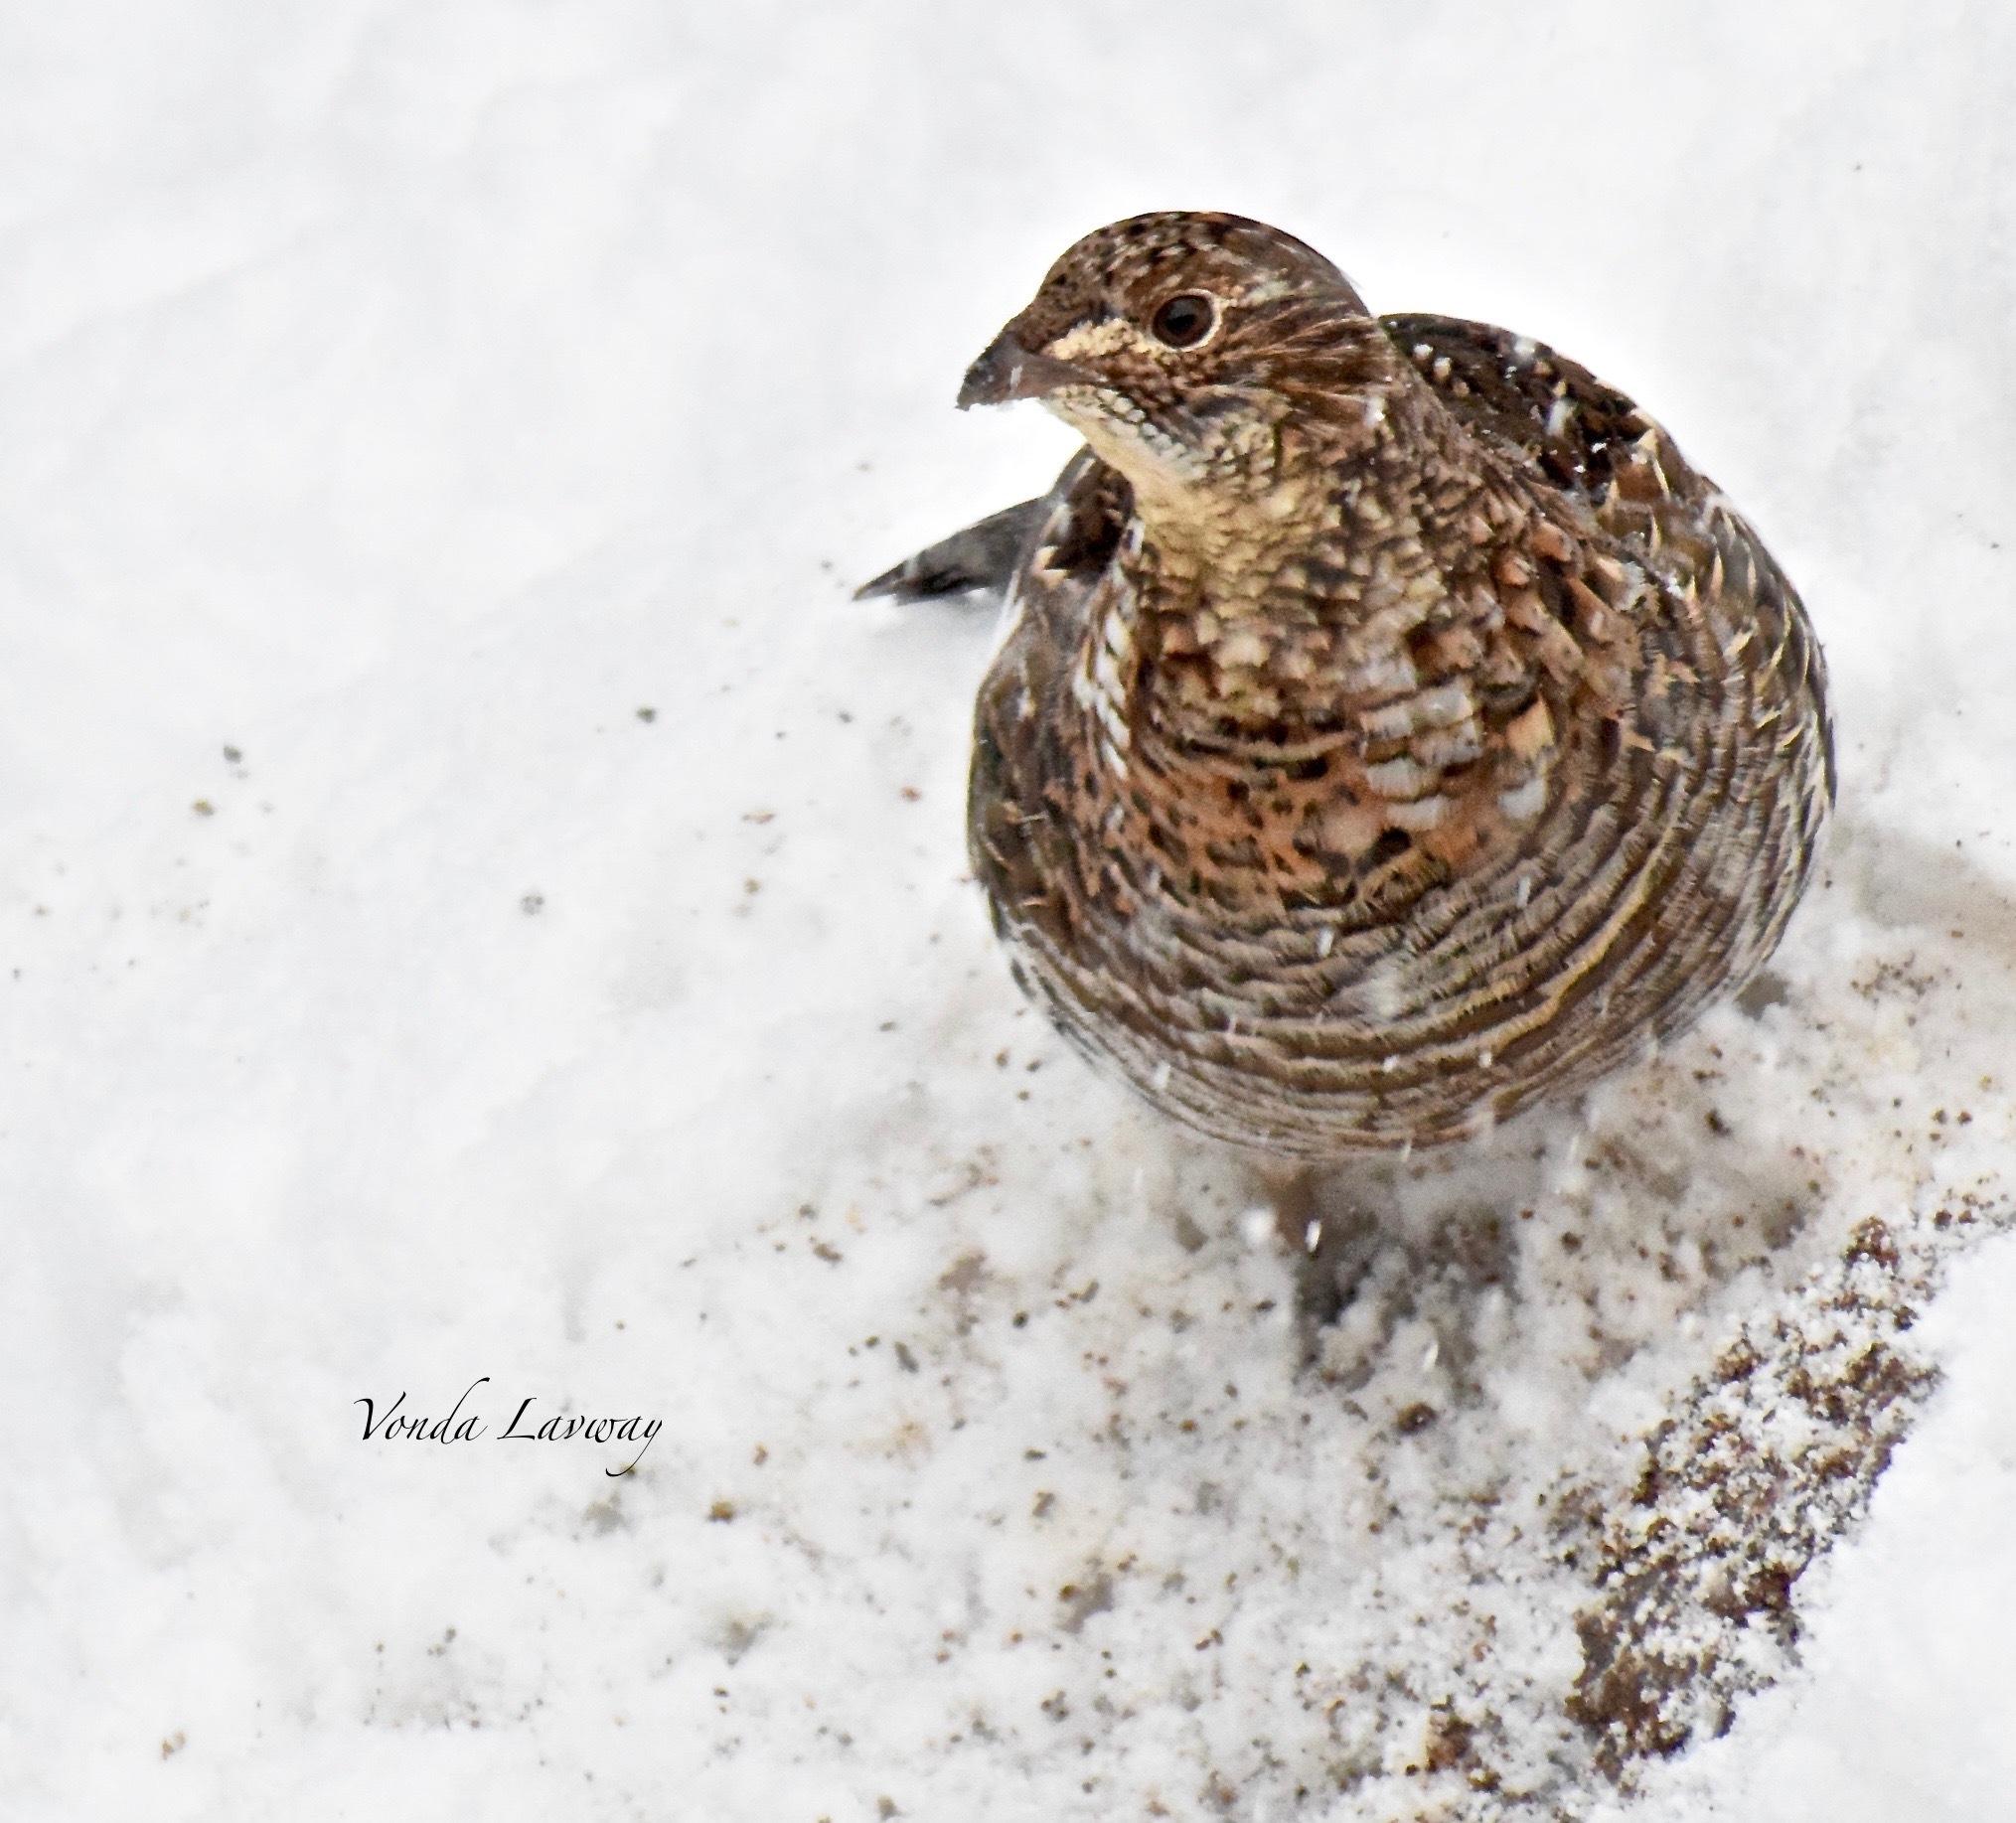 Winter Visitor by vonda.lavway